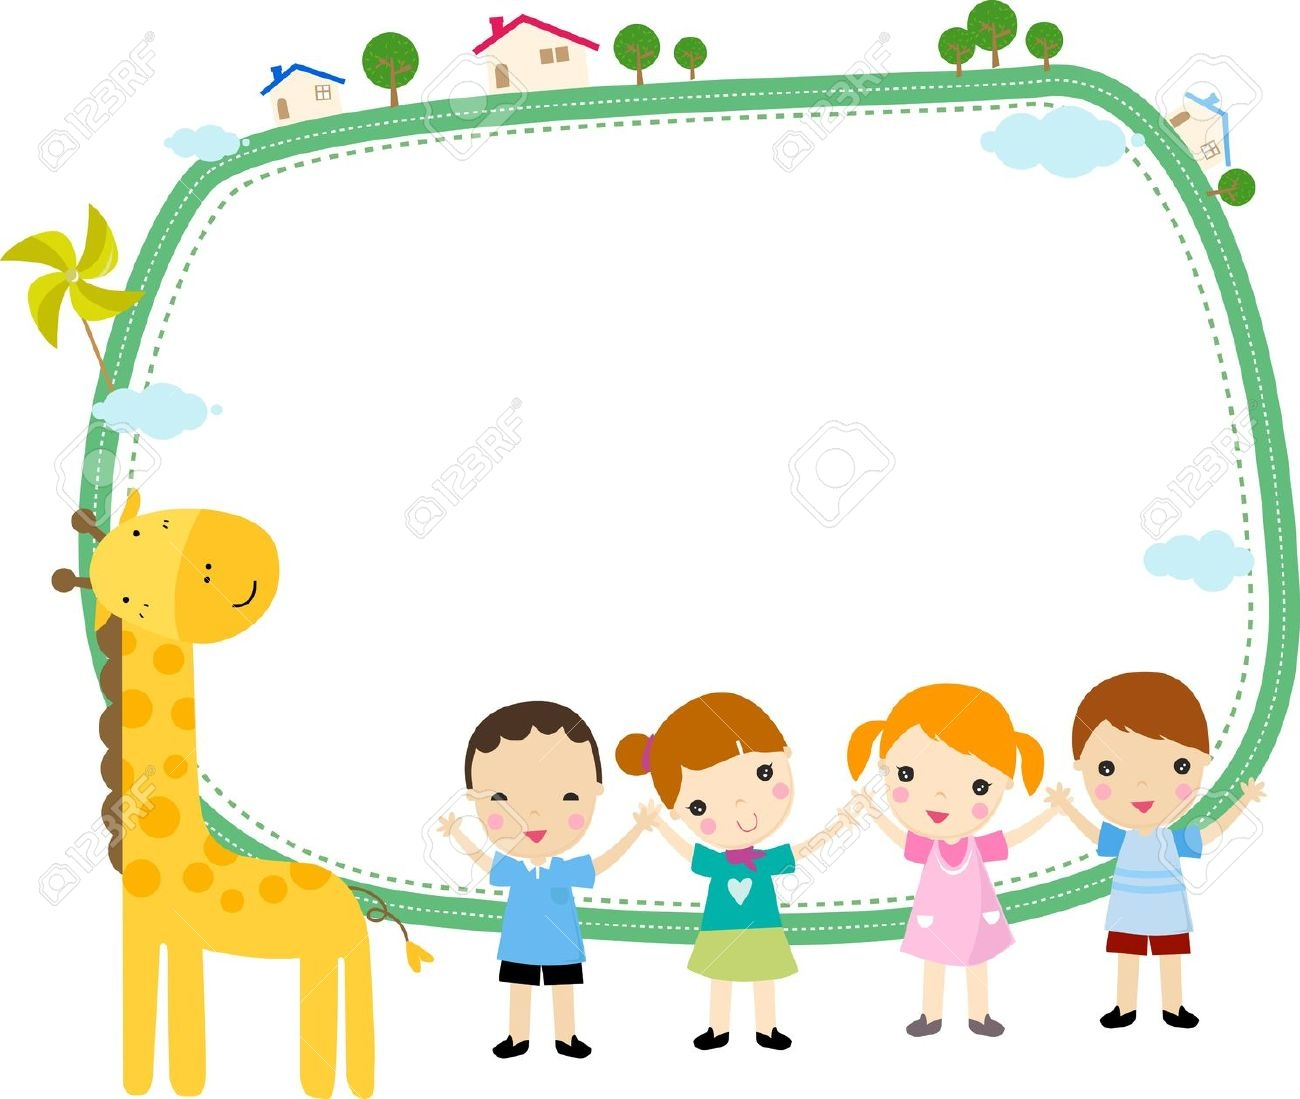 preschool border free download best preschool border on free panda clipart for colored background free clipart panda earth